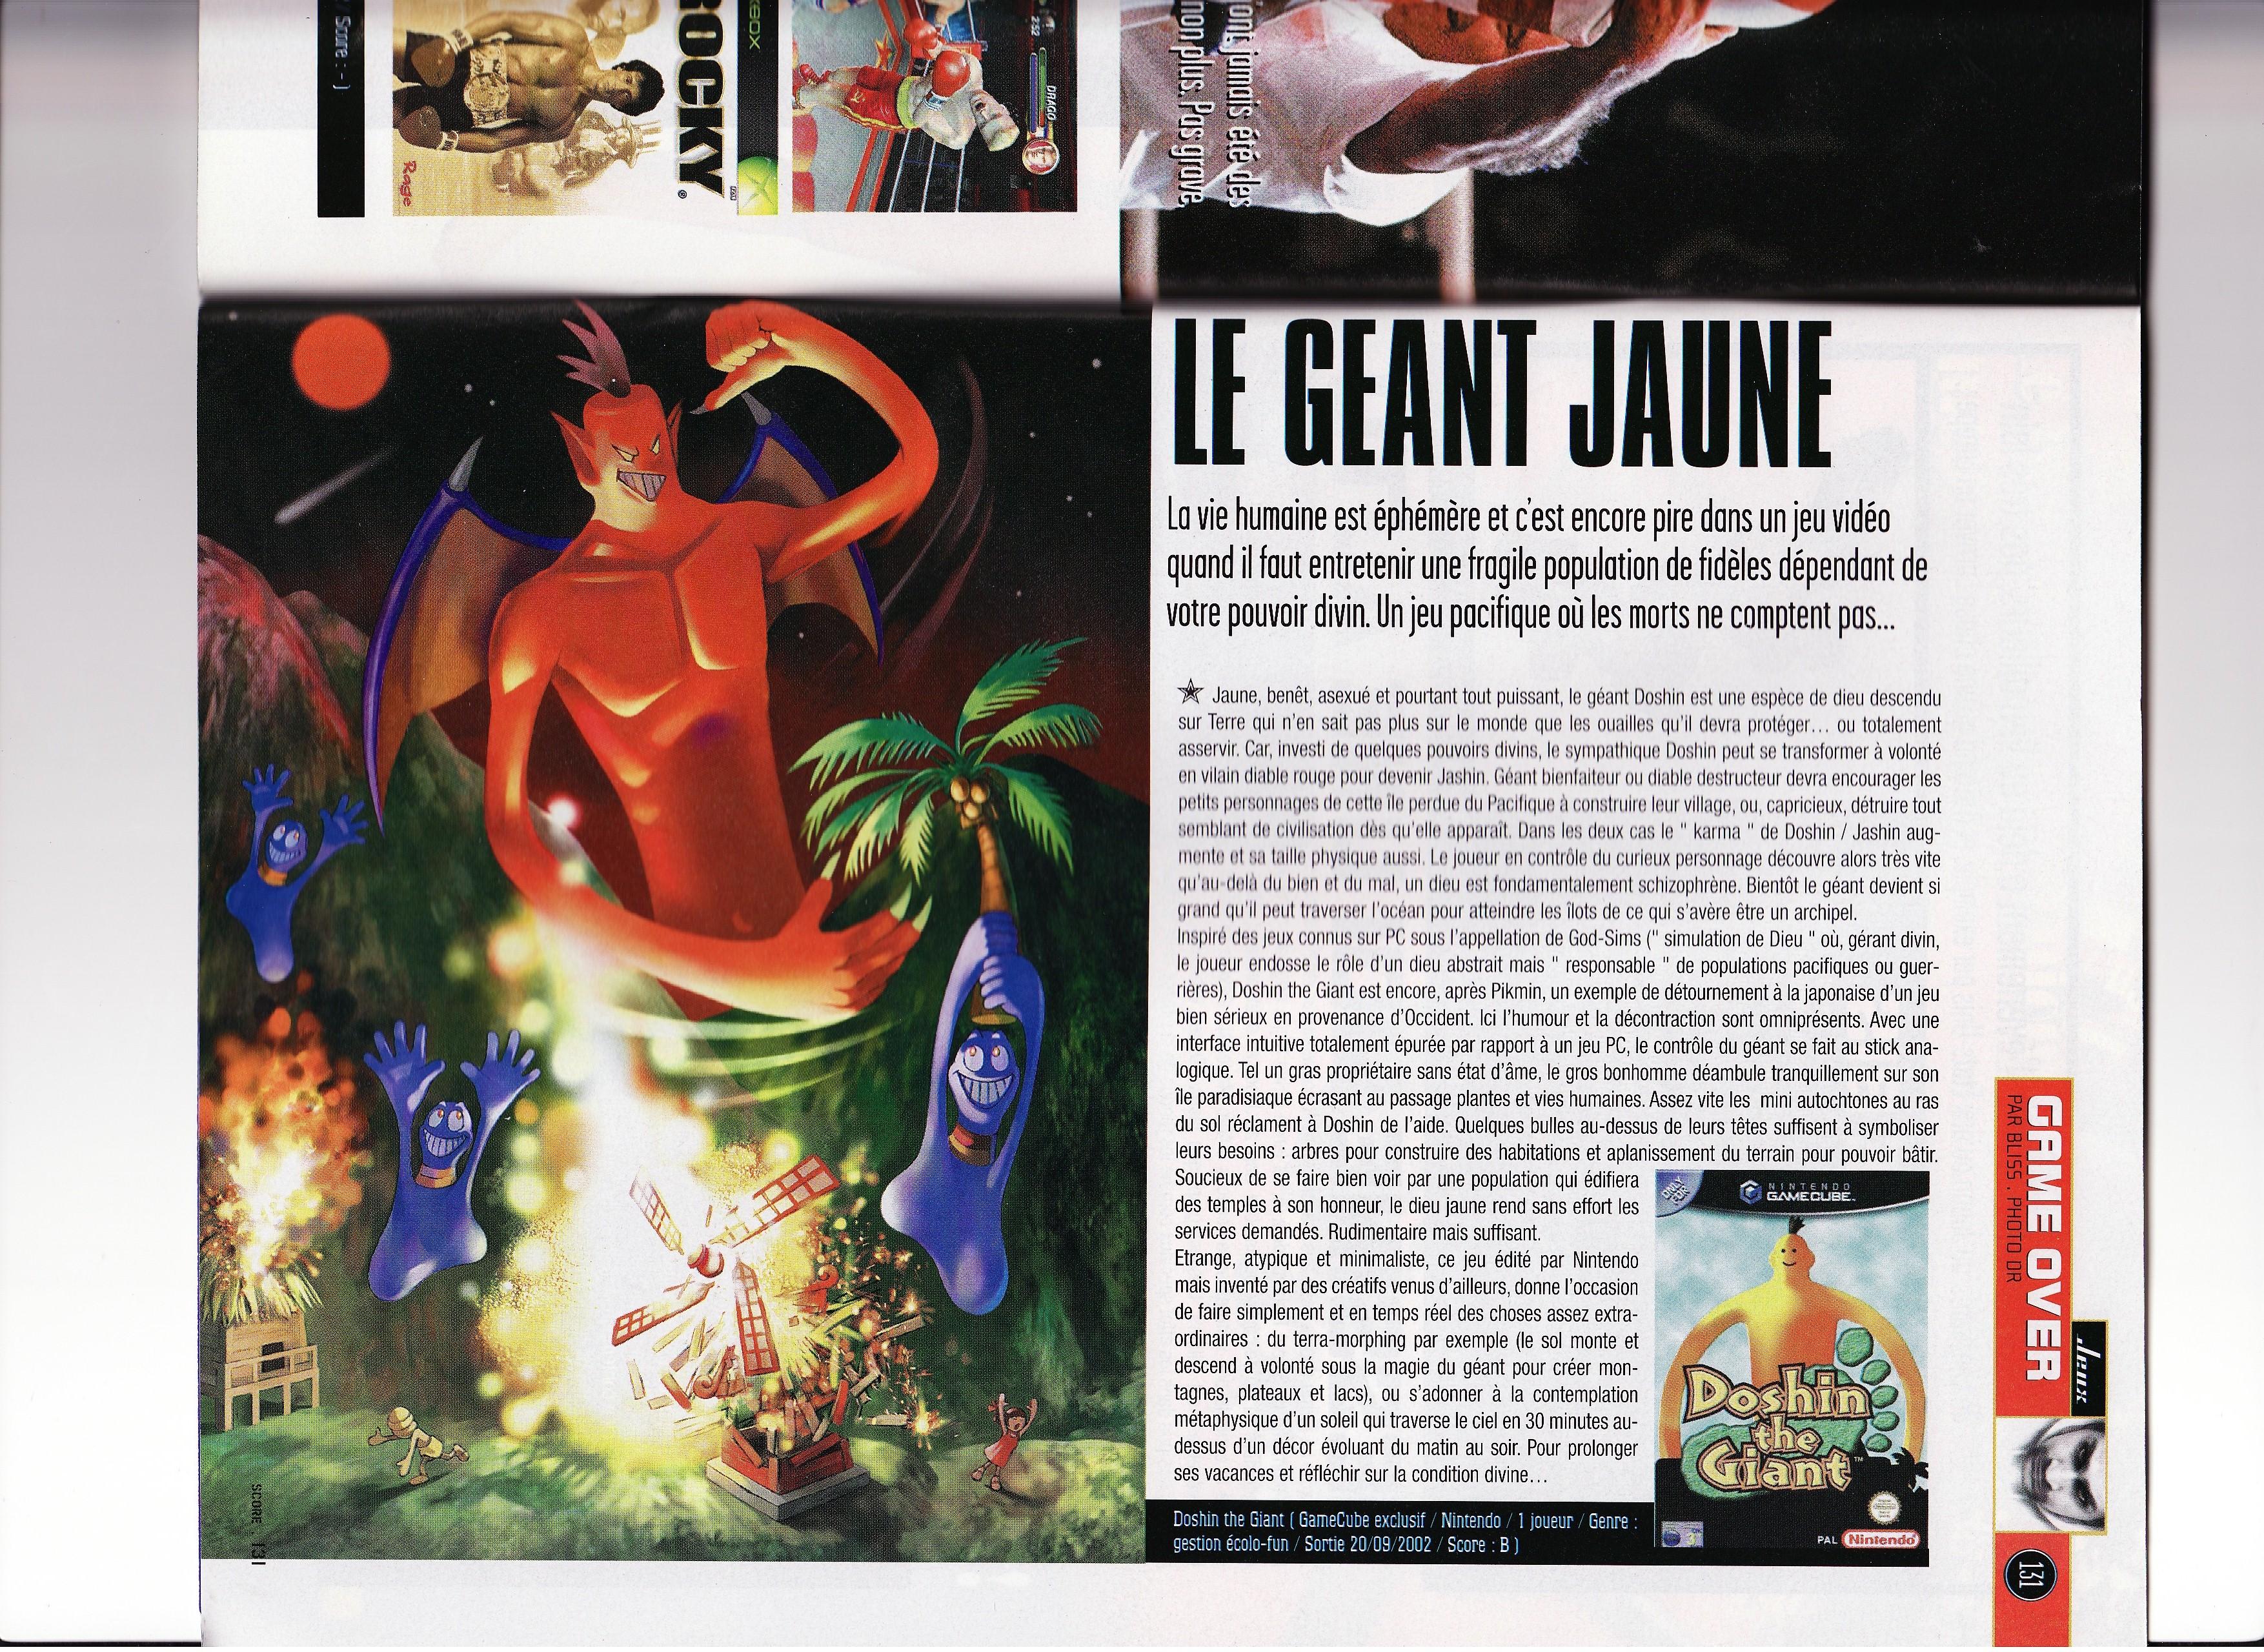 Doshin the Giant : LE GEANT JAUNE